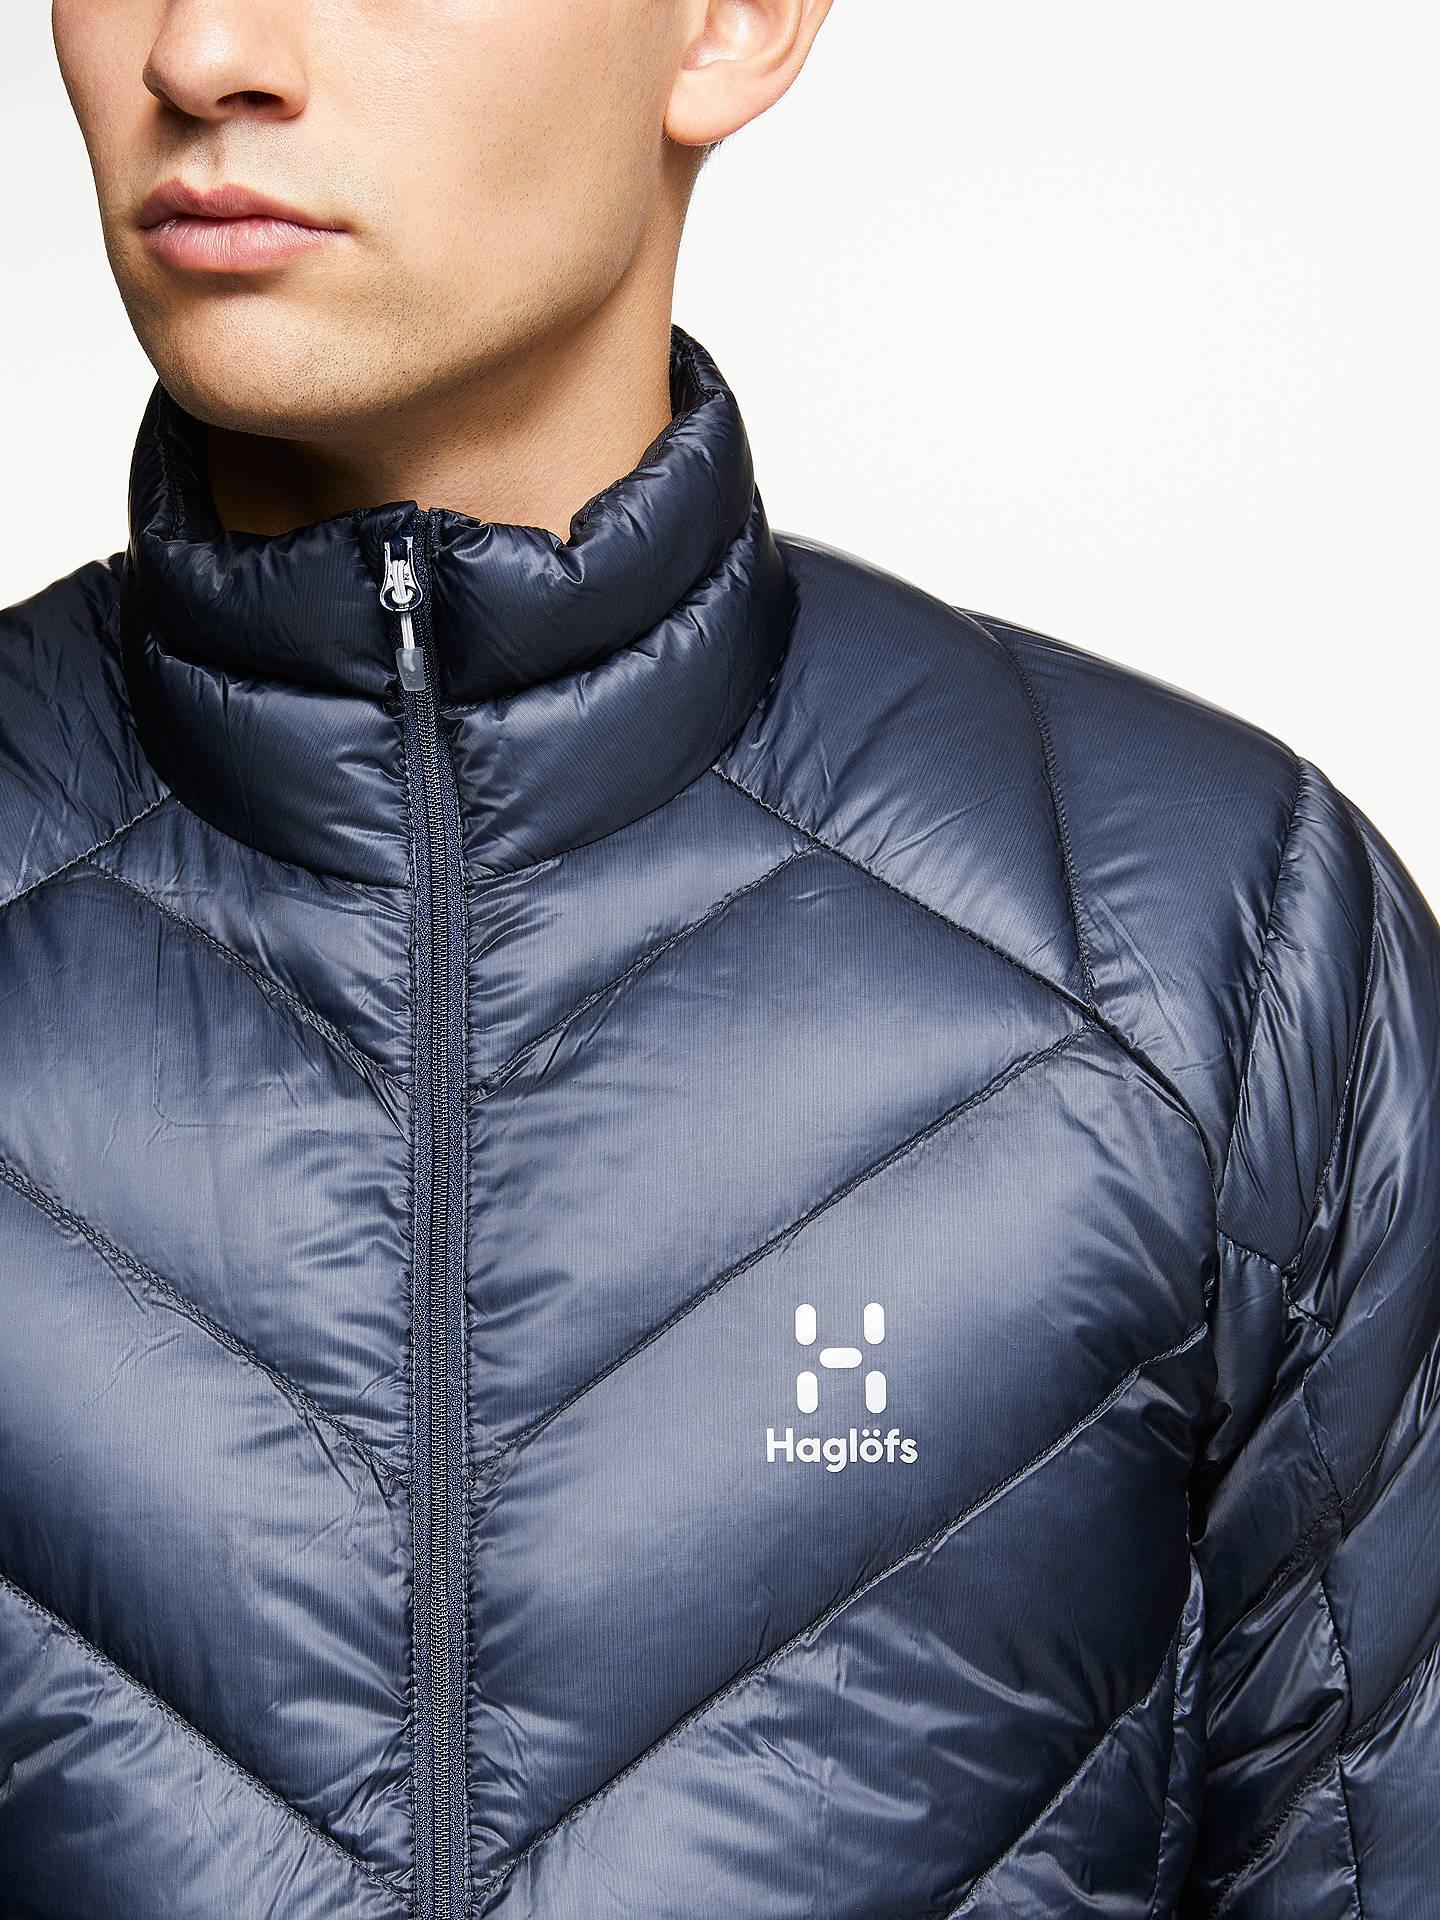 df37c5eb Buy Haglöfs L.I.M Essens Men's Insulated Jacket, Tarn Blue, S Online at  johnlewis.